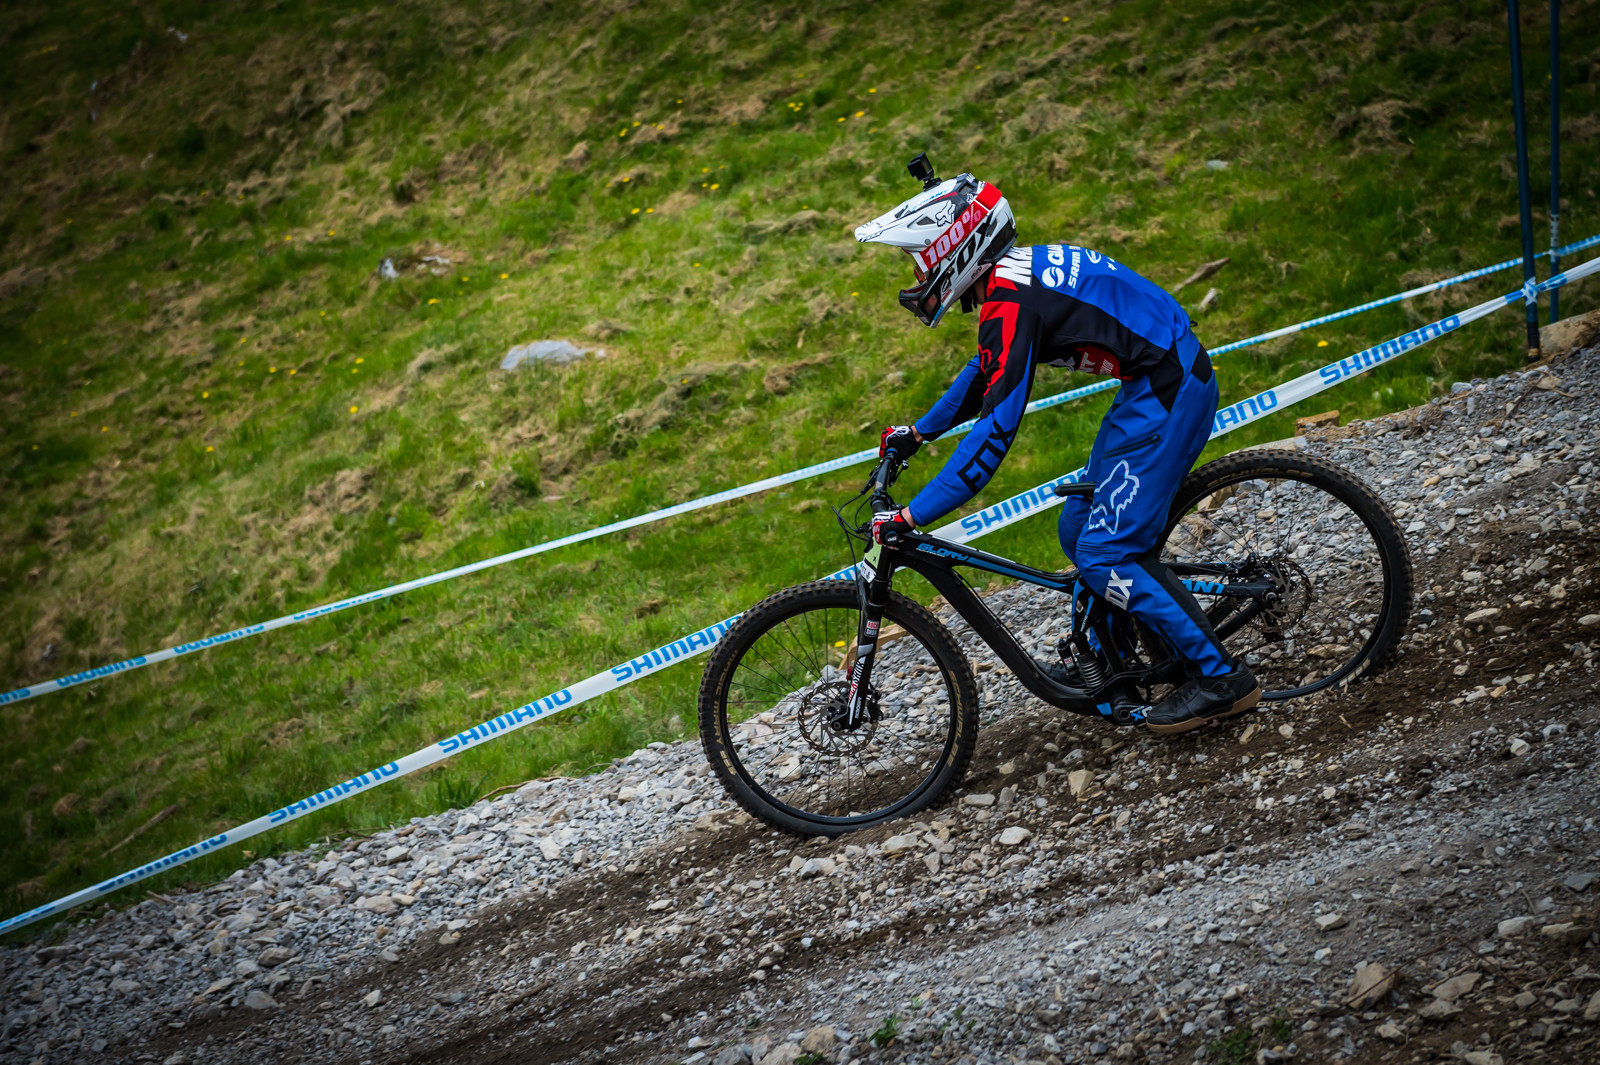 Alex Marin G-Out Project - Lourdes World Cup - G-Out Project - Lourdes World Cup - Mountain Biking Pictures - Vital MTB